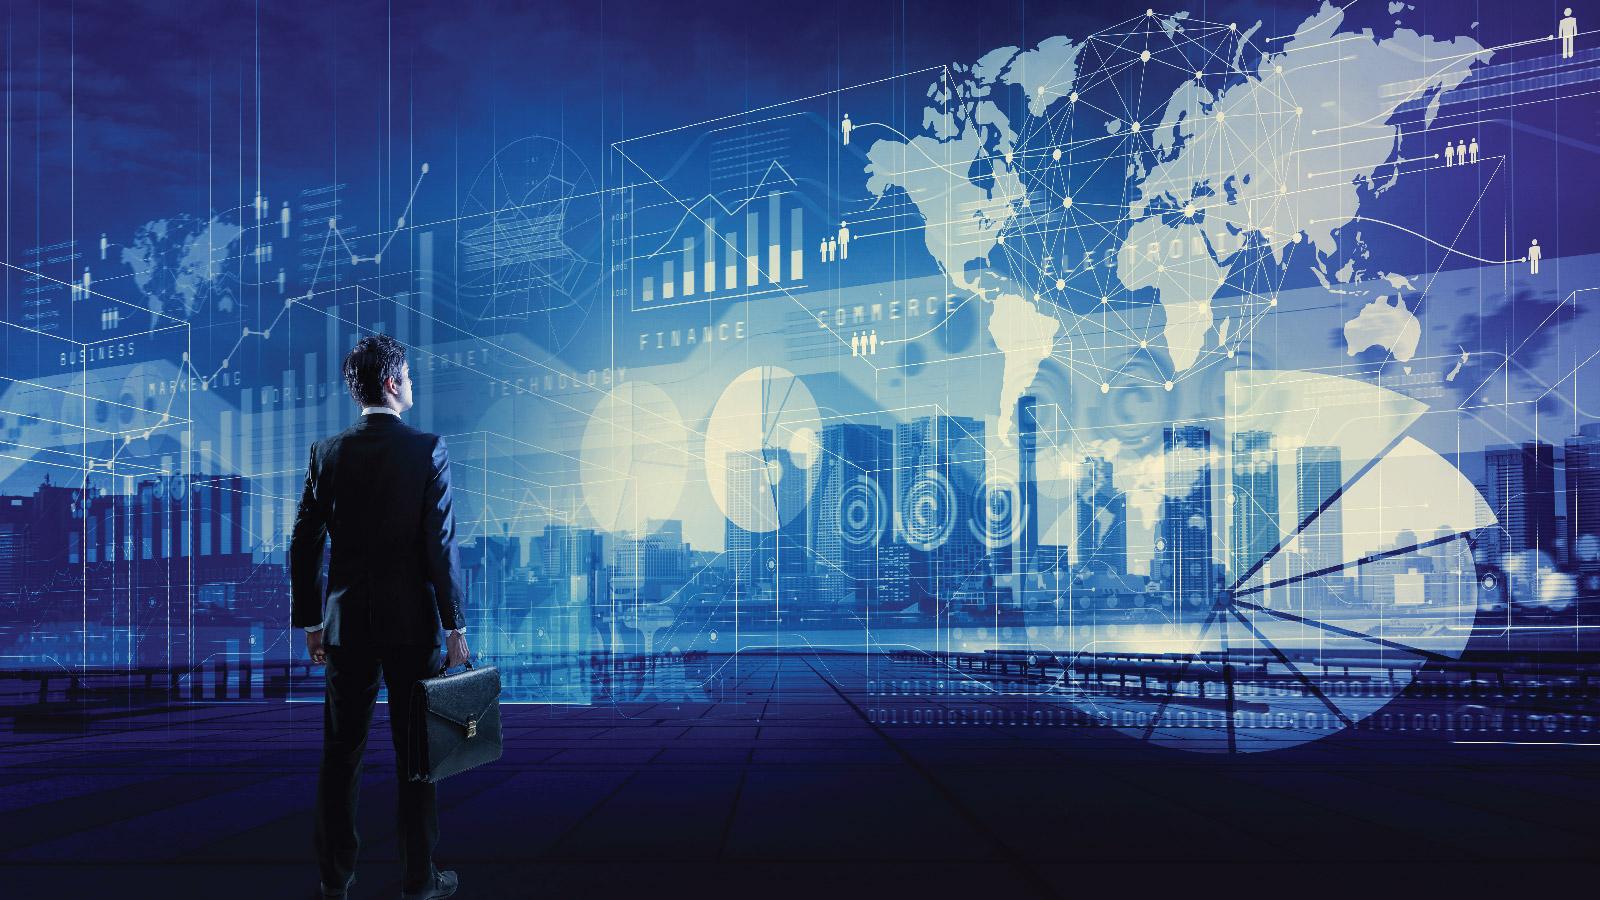 5G, Digital Transformation, Banking, Manufacturing, 5G, Automation, Google, Google Nest Hube, Bitcoin, Chatbots